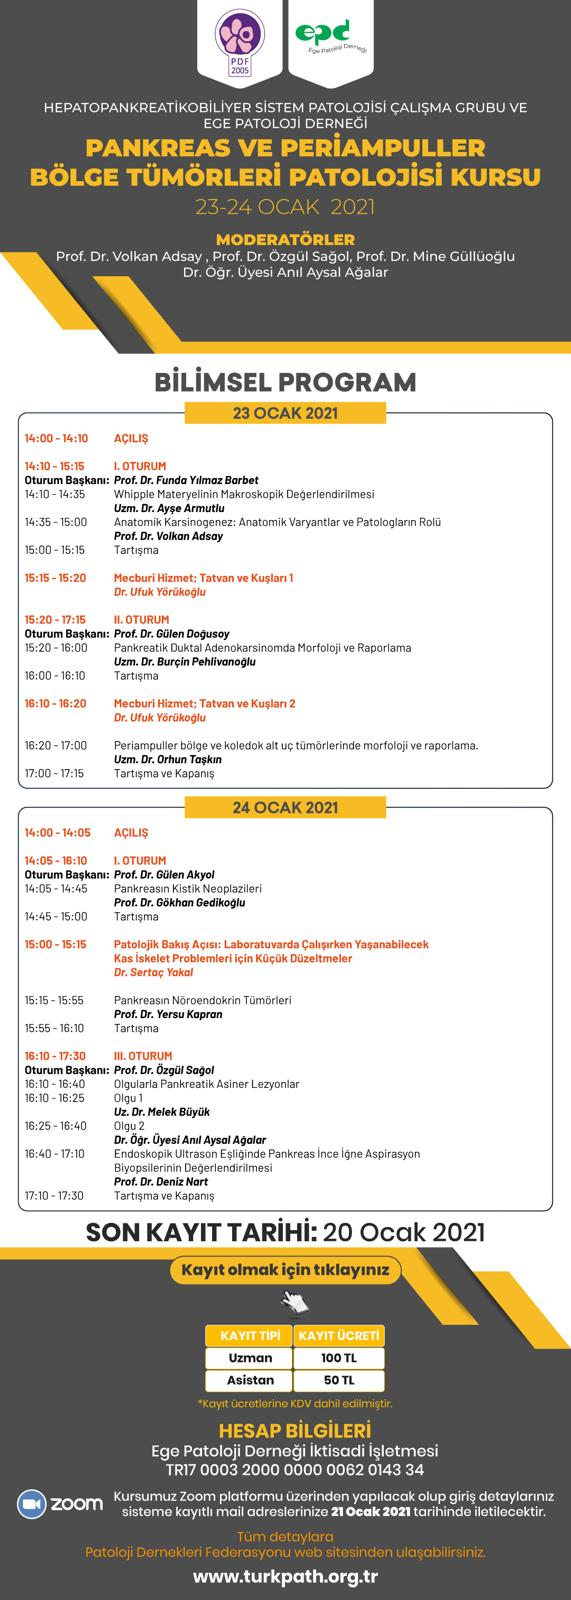 23-24 Ocak 2021 Pankreas ve Periampuller Bölge Tümörleri Patolojisi Kursu